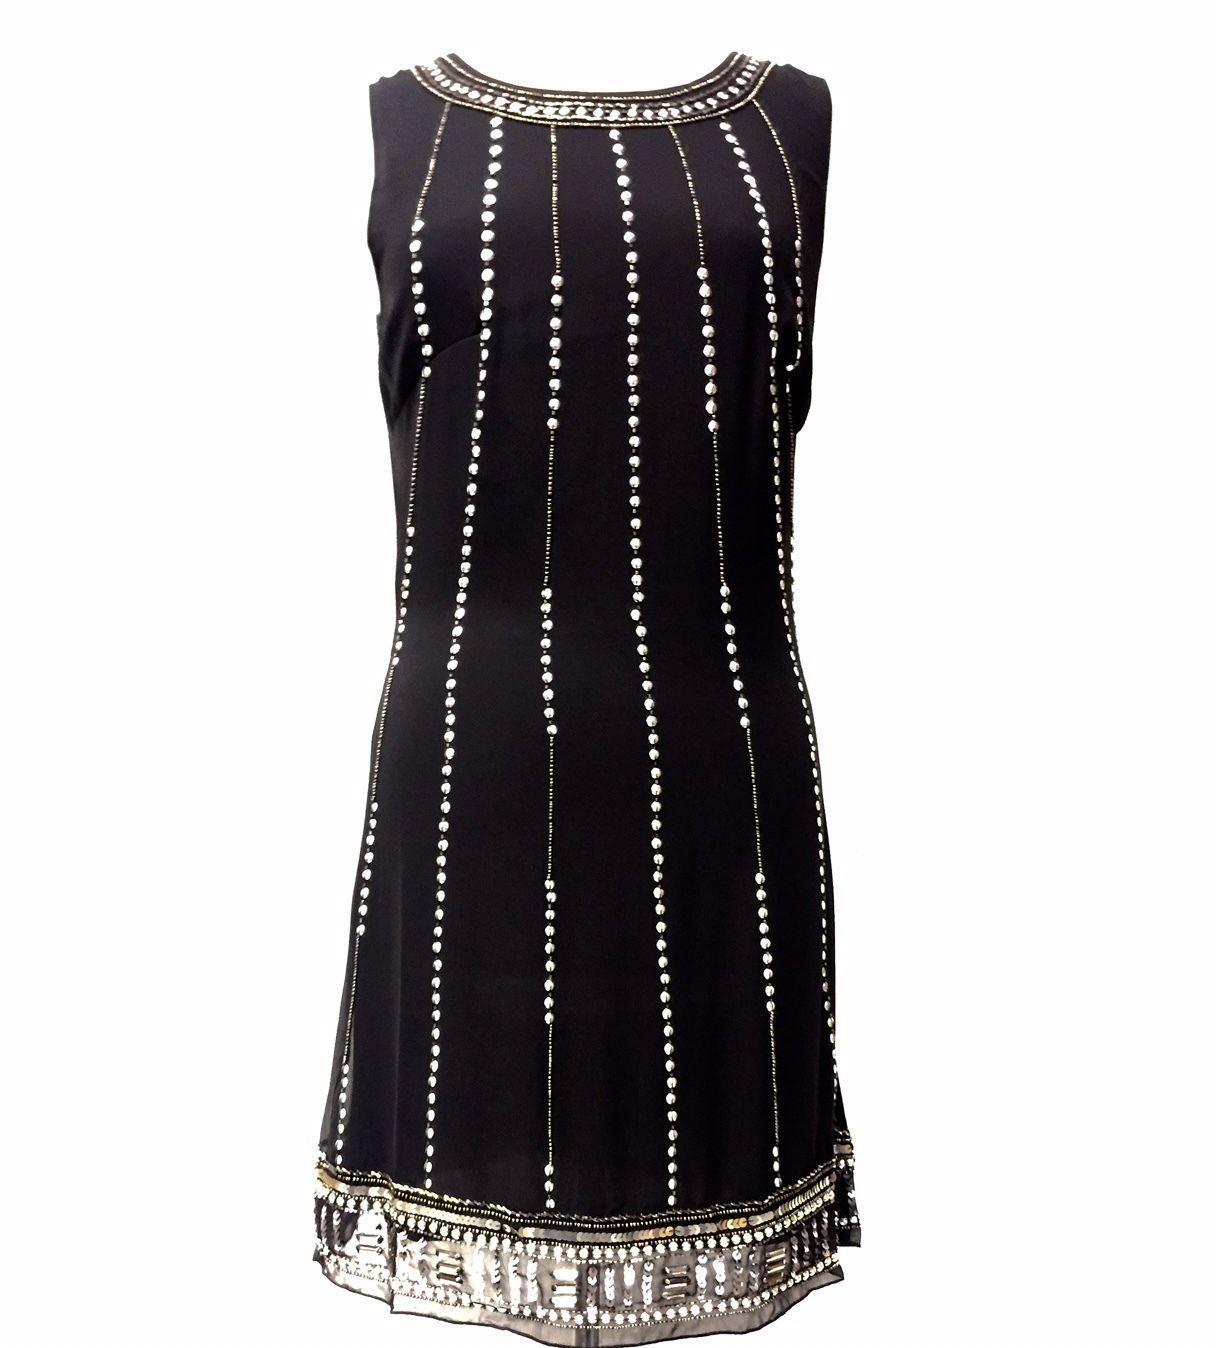 Bnwt ladies black dress tunic top evening us shift dress size